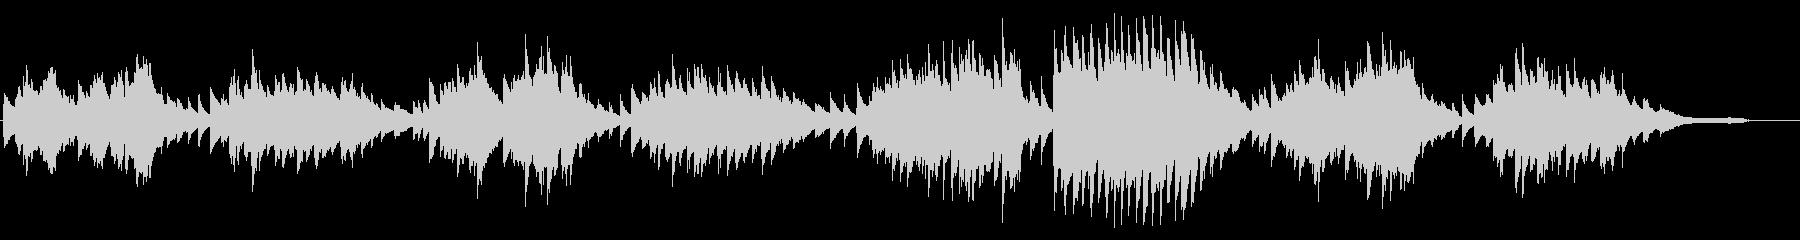 Chopinata Waltzの未再生の波形